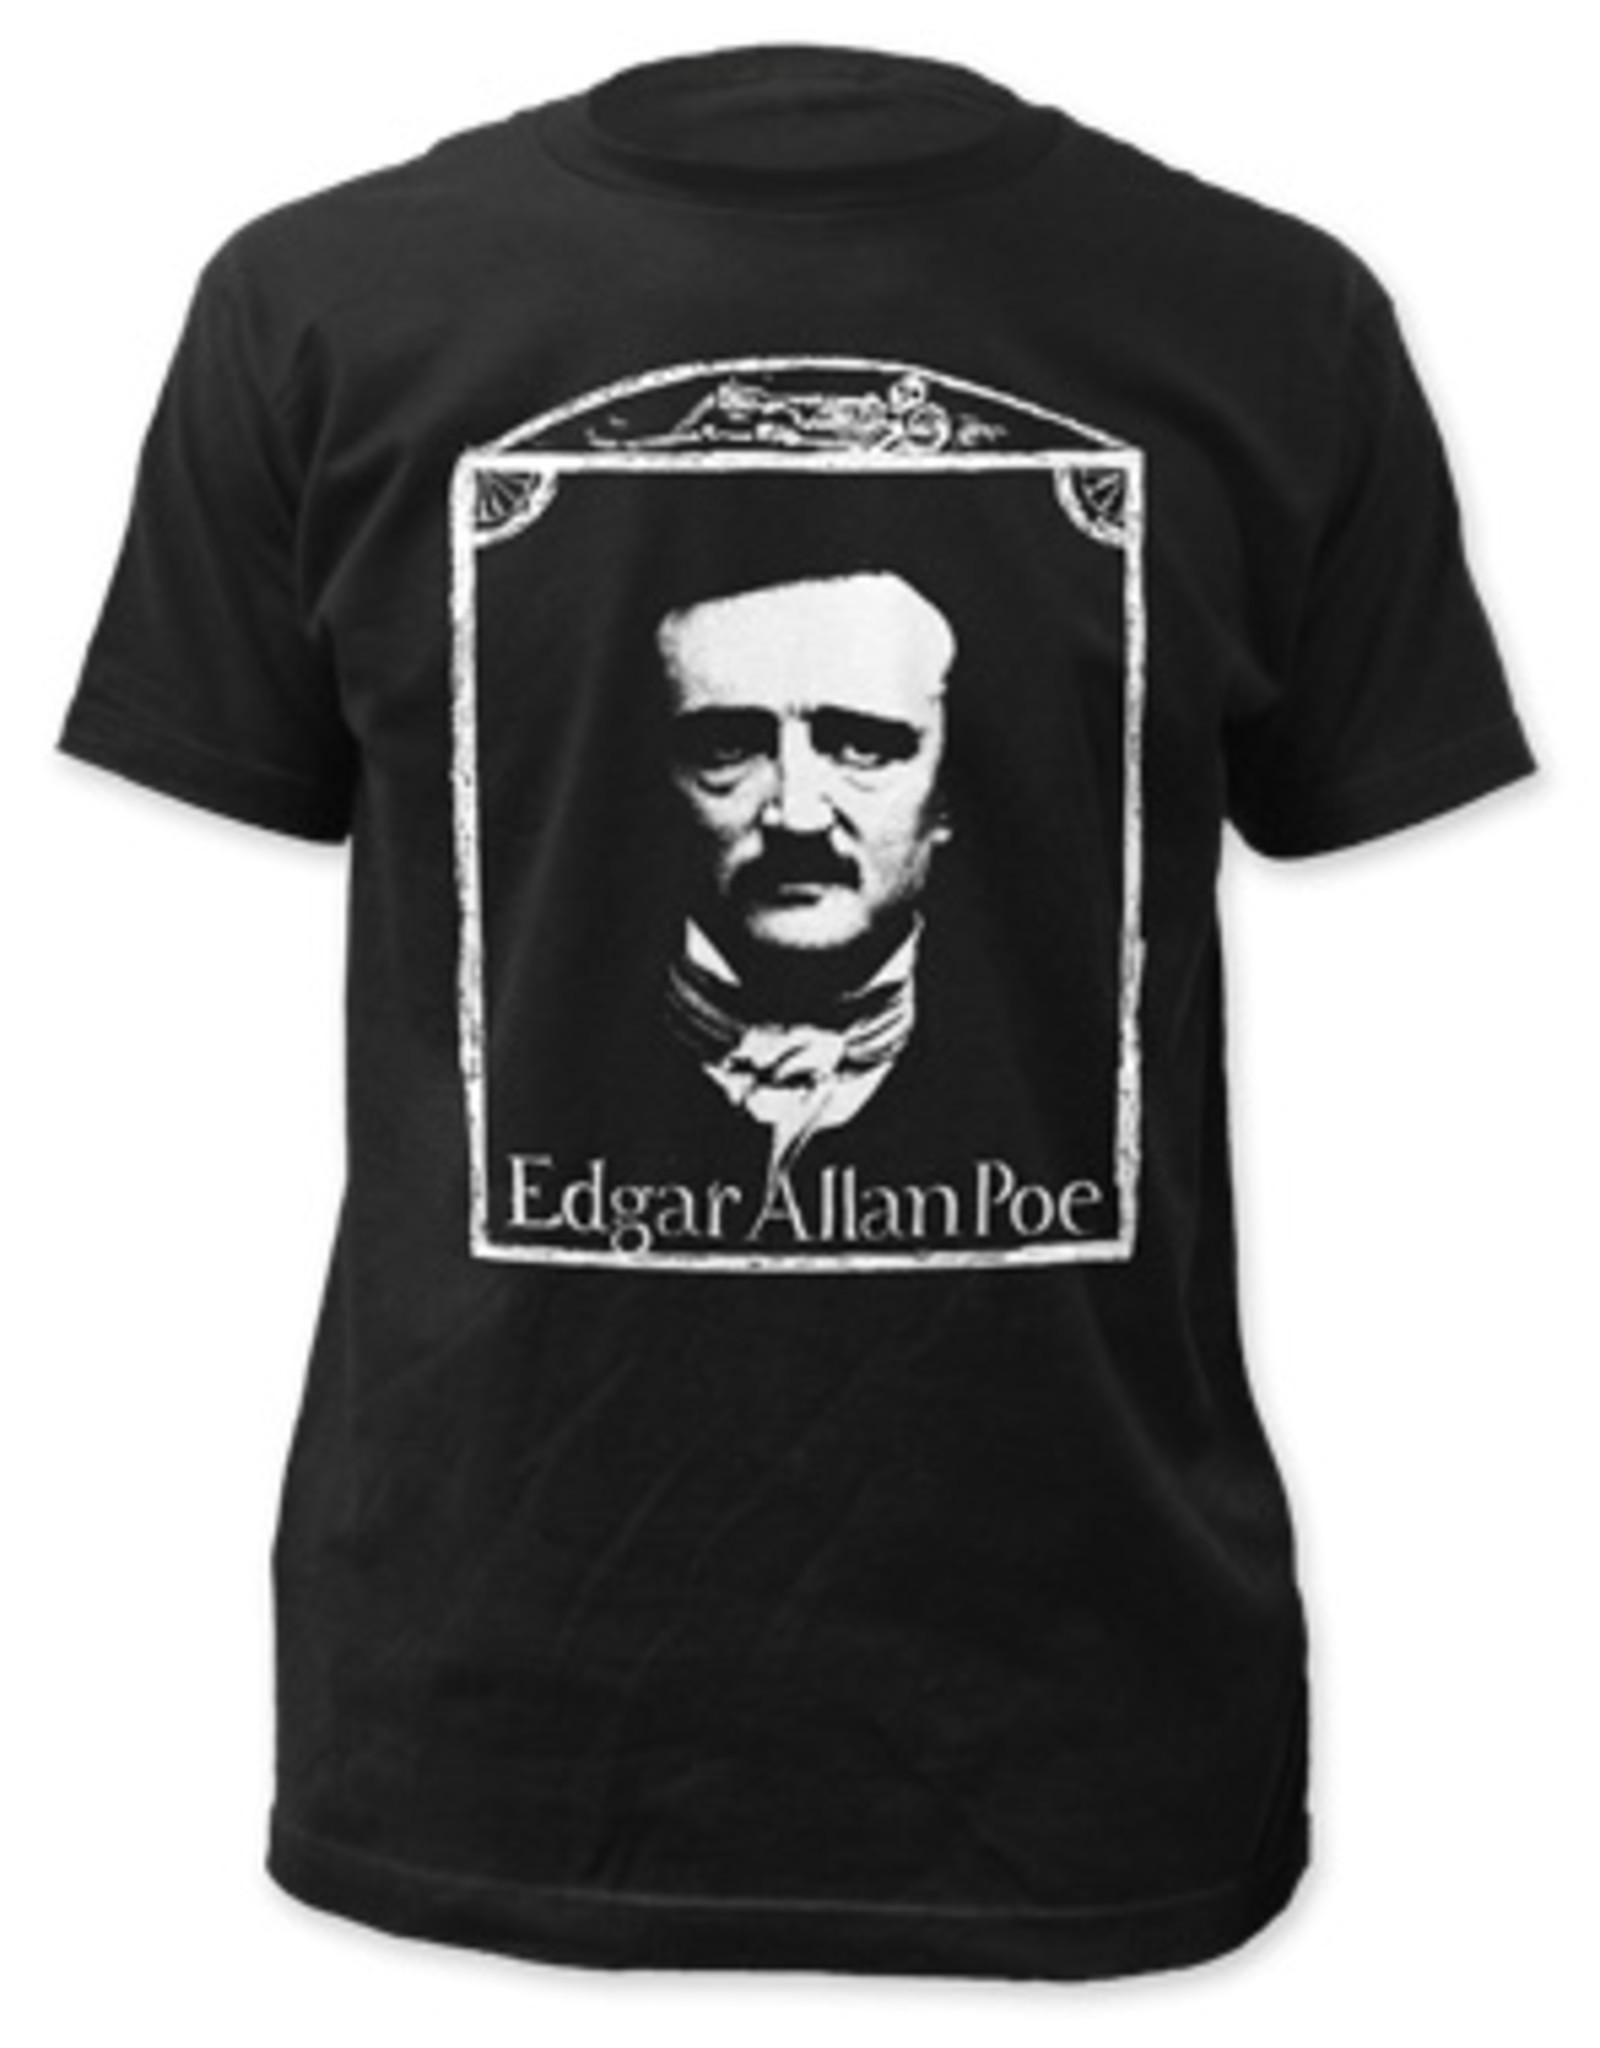 Impact Merchandising Poe Tee